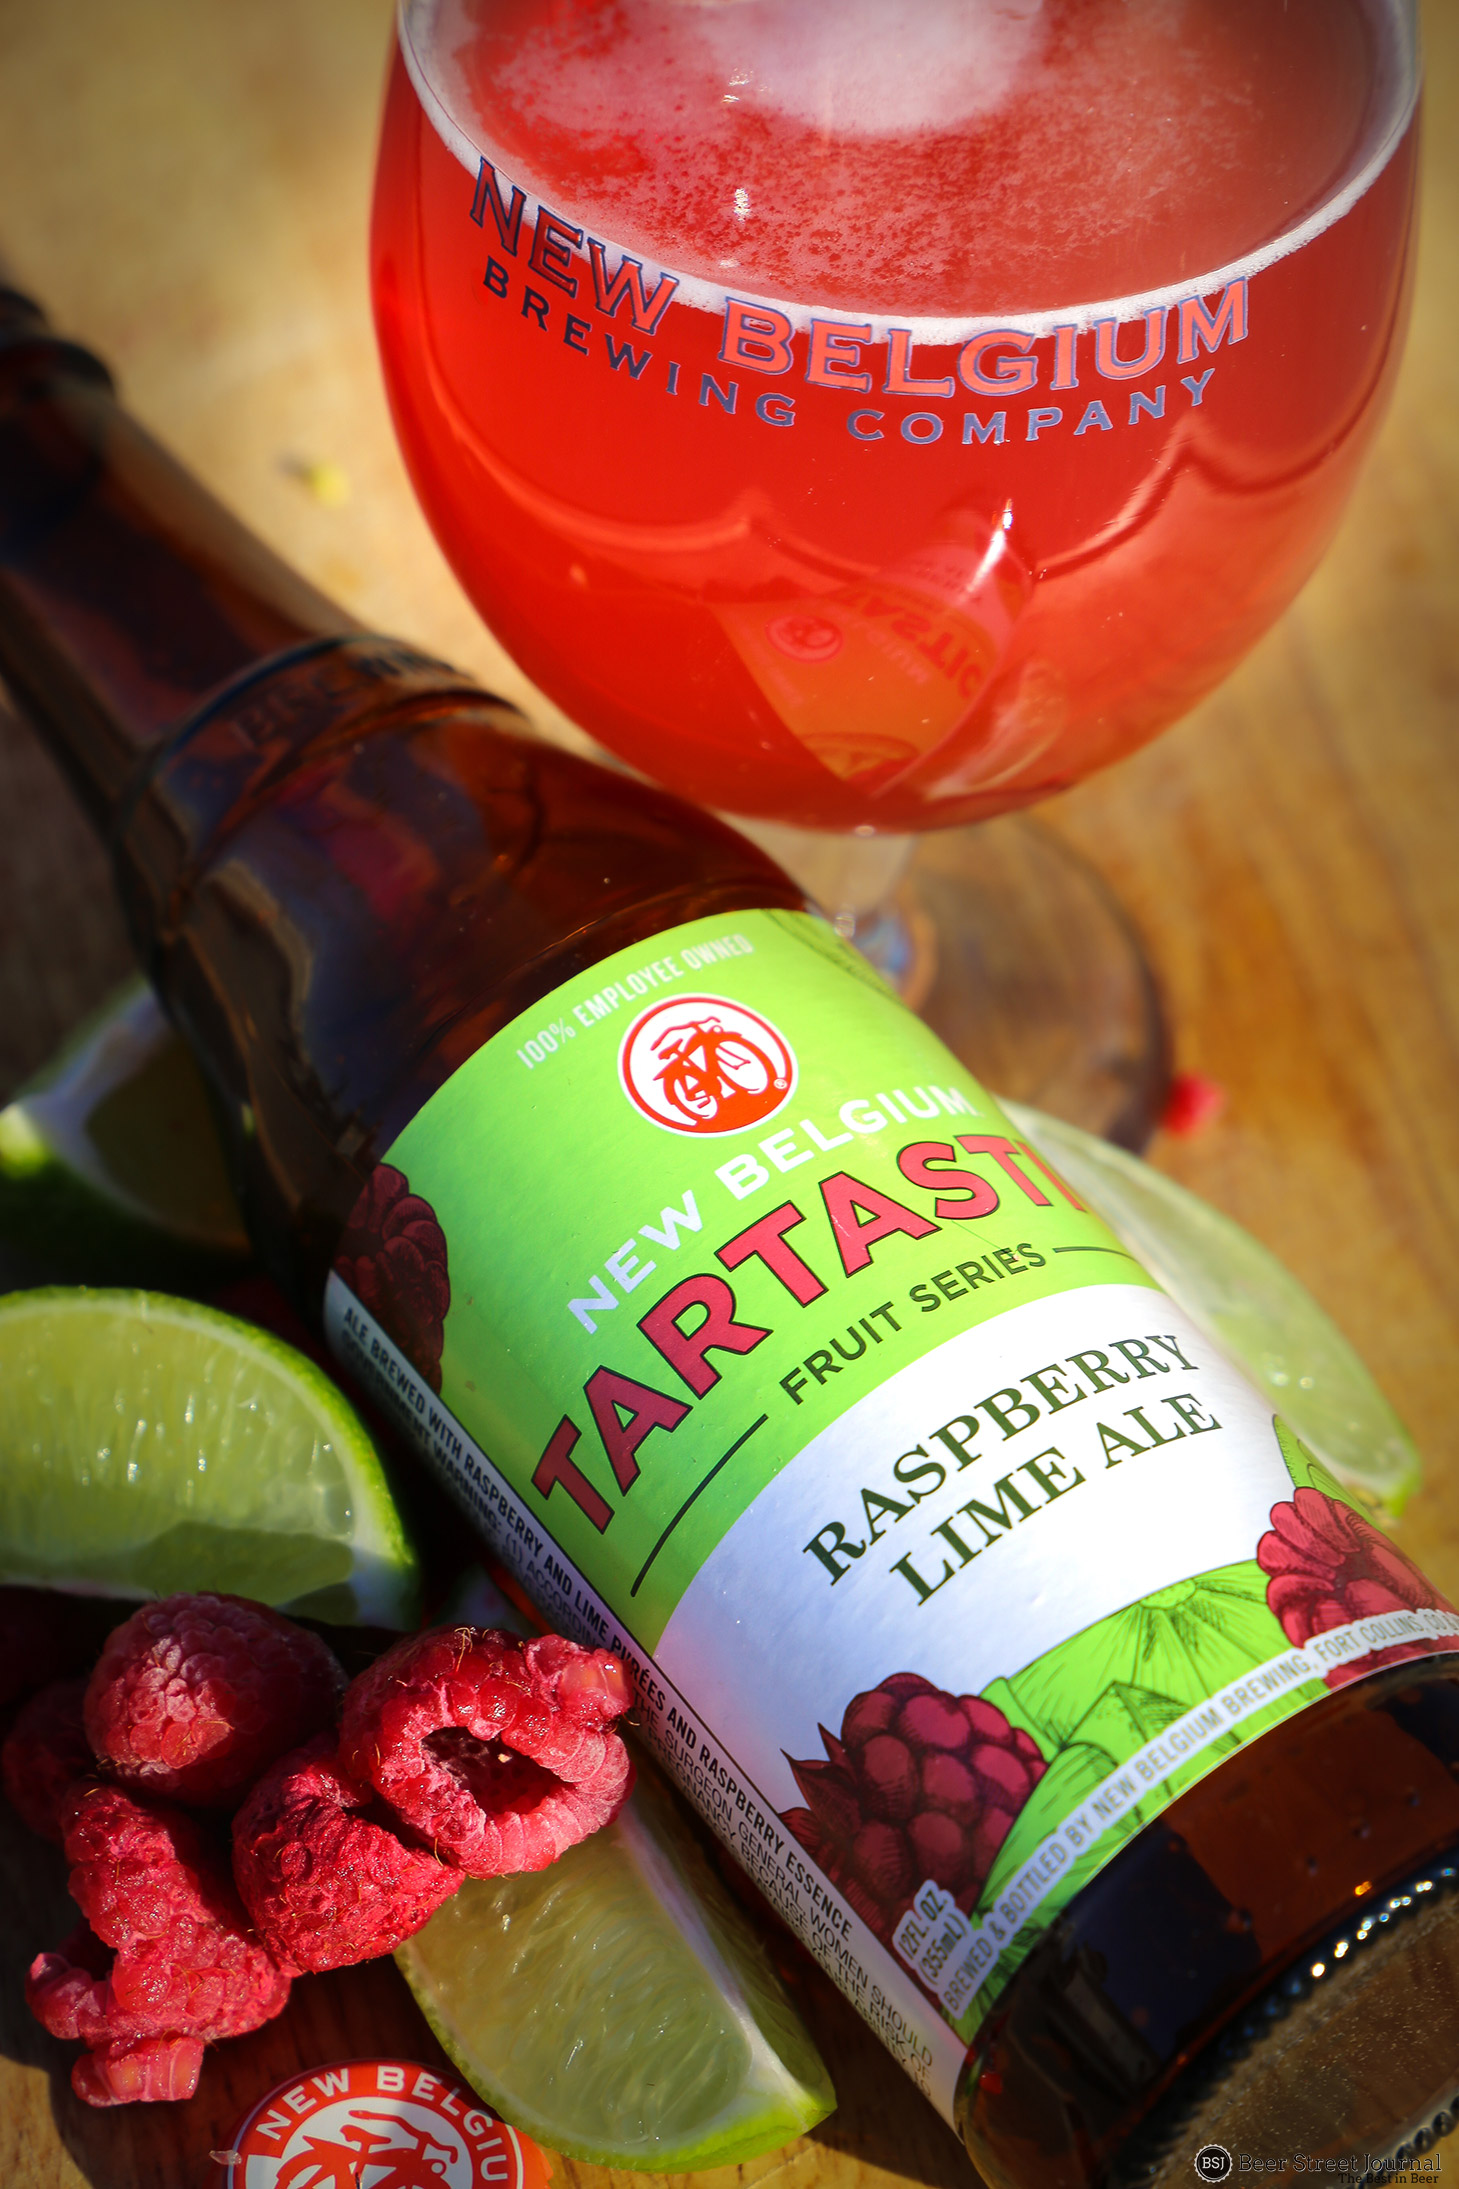 new belgium tartastic raspberry lime ale expands tart series journal new belgium tartastic raspberry lime ale expands tart series journal